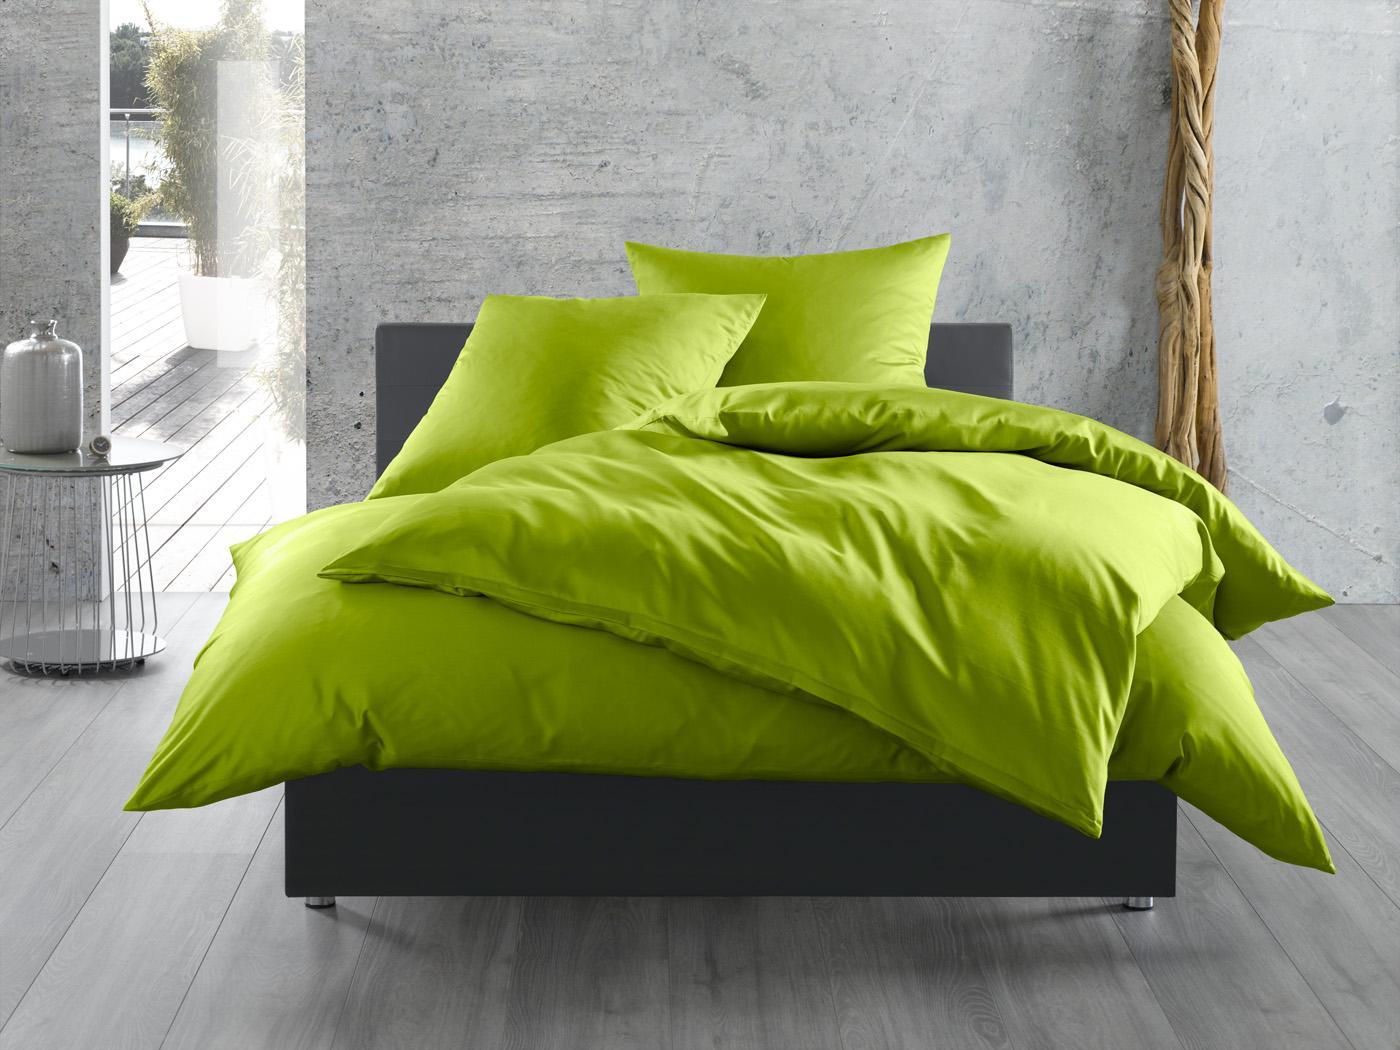 Mako Satin Bettwäsche uni grün 200x220